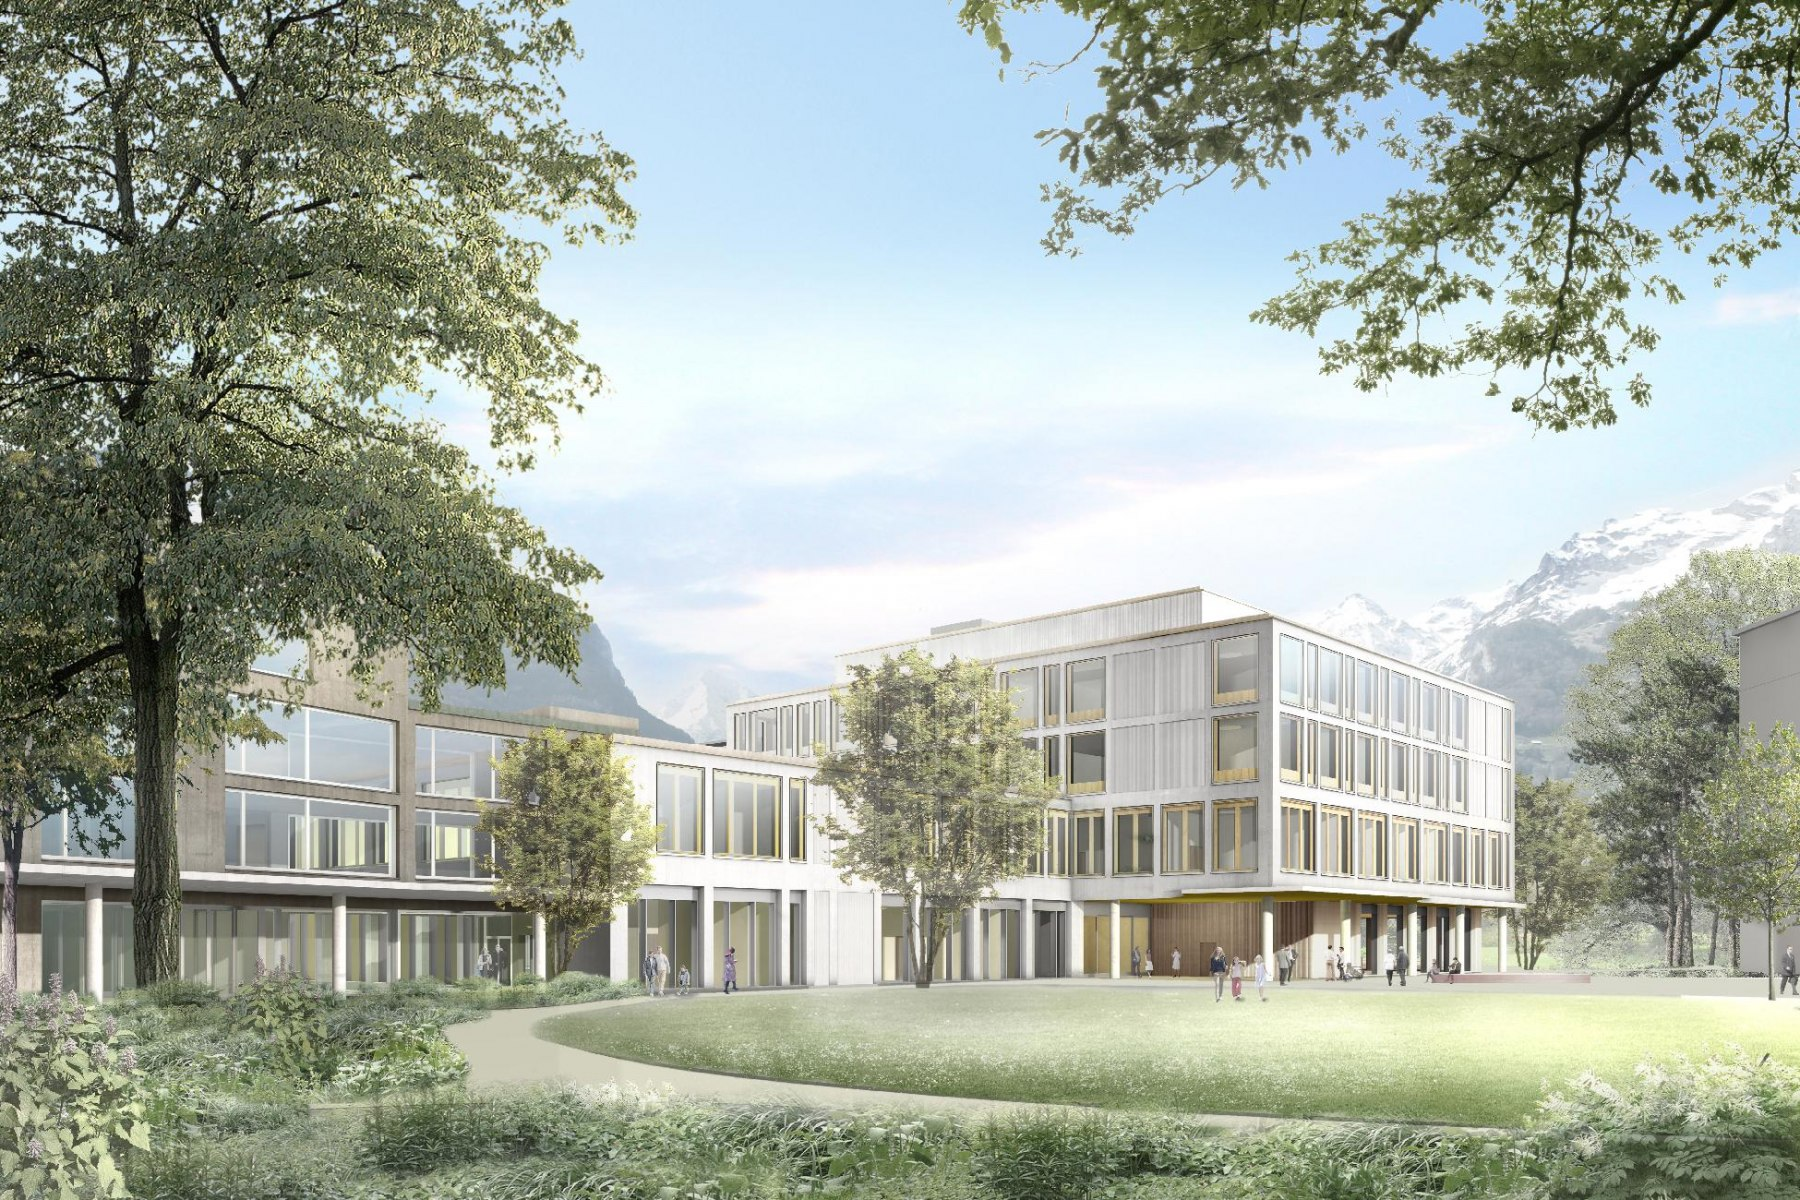 bhp-baumanagement-AG-Neubau-Kantonsspital-Uri-Overview-1